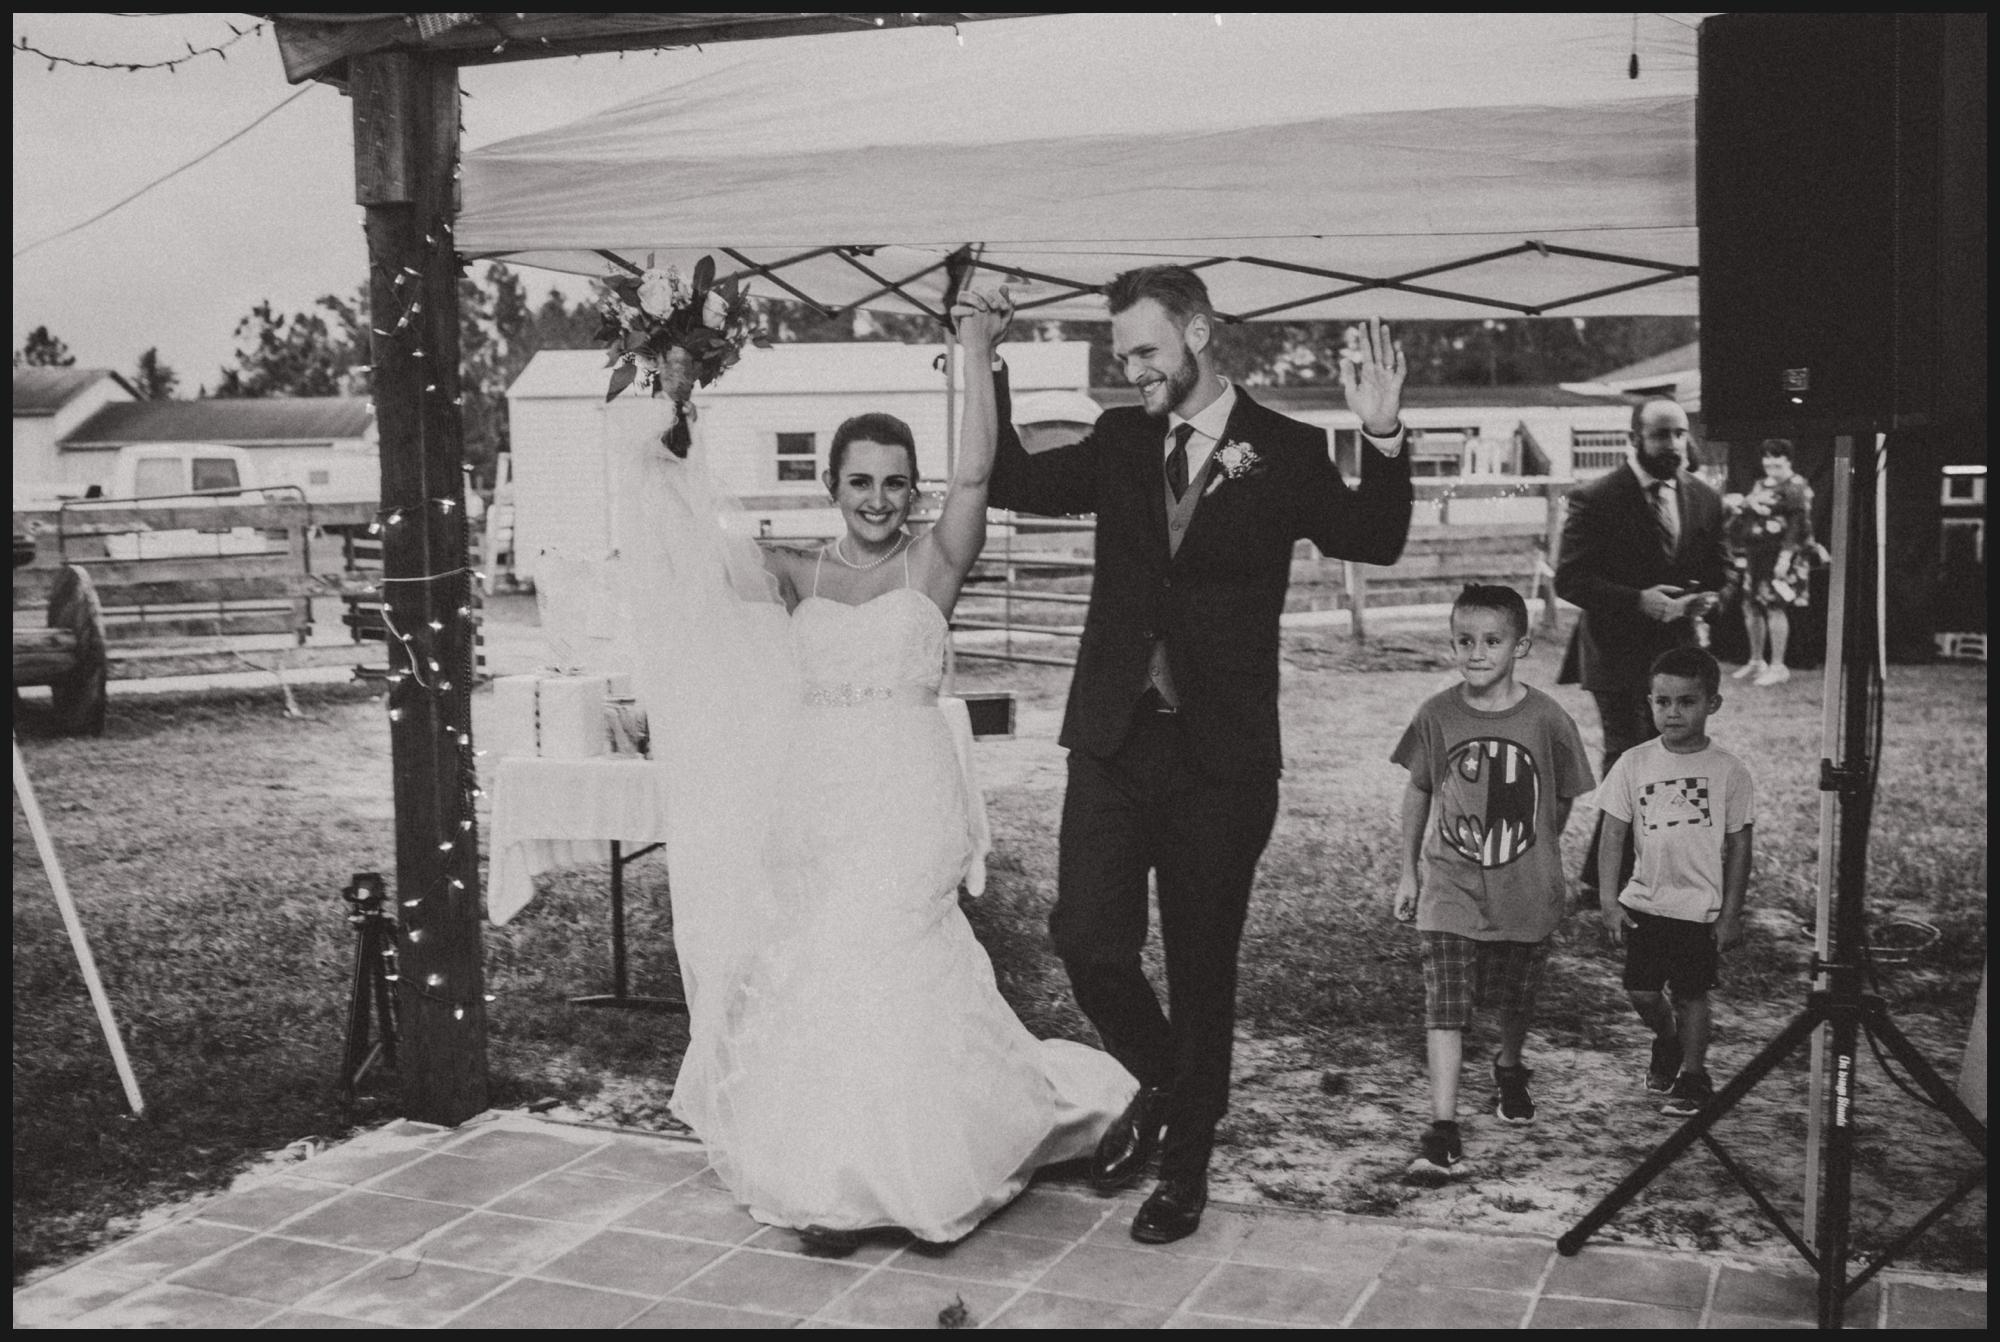 Orlando-Wedding-Photographer-destination-wedding-photographer-florida-wedding-photographer-bohemian-wedding-photographer_0369.jpg